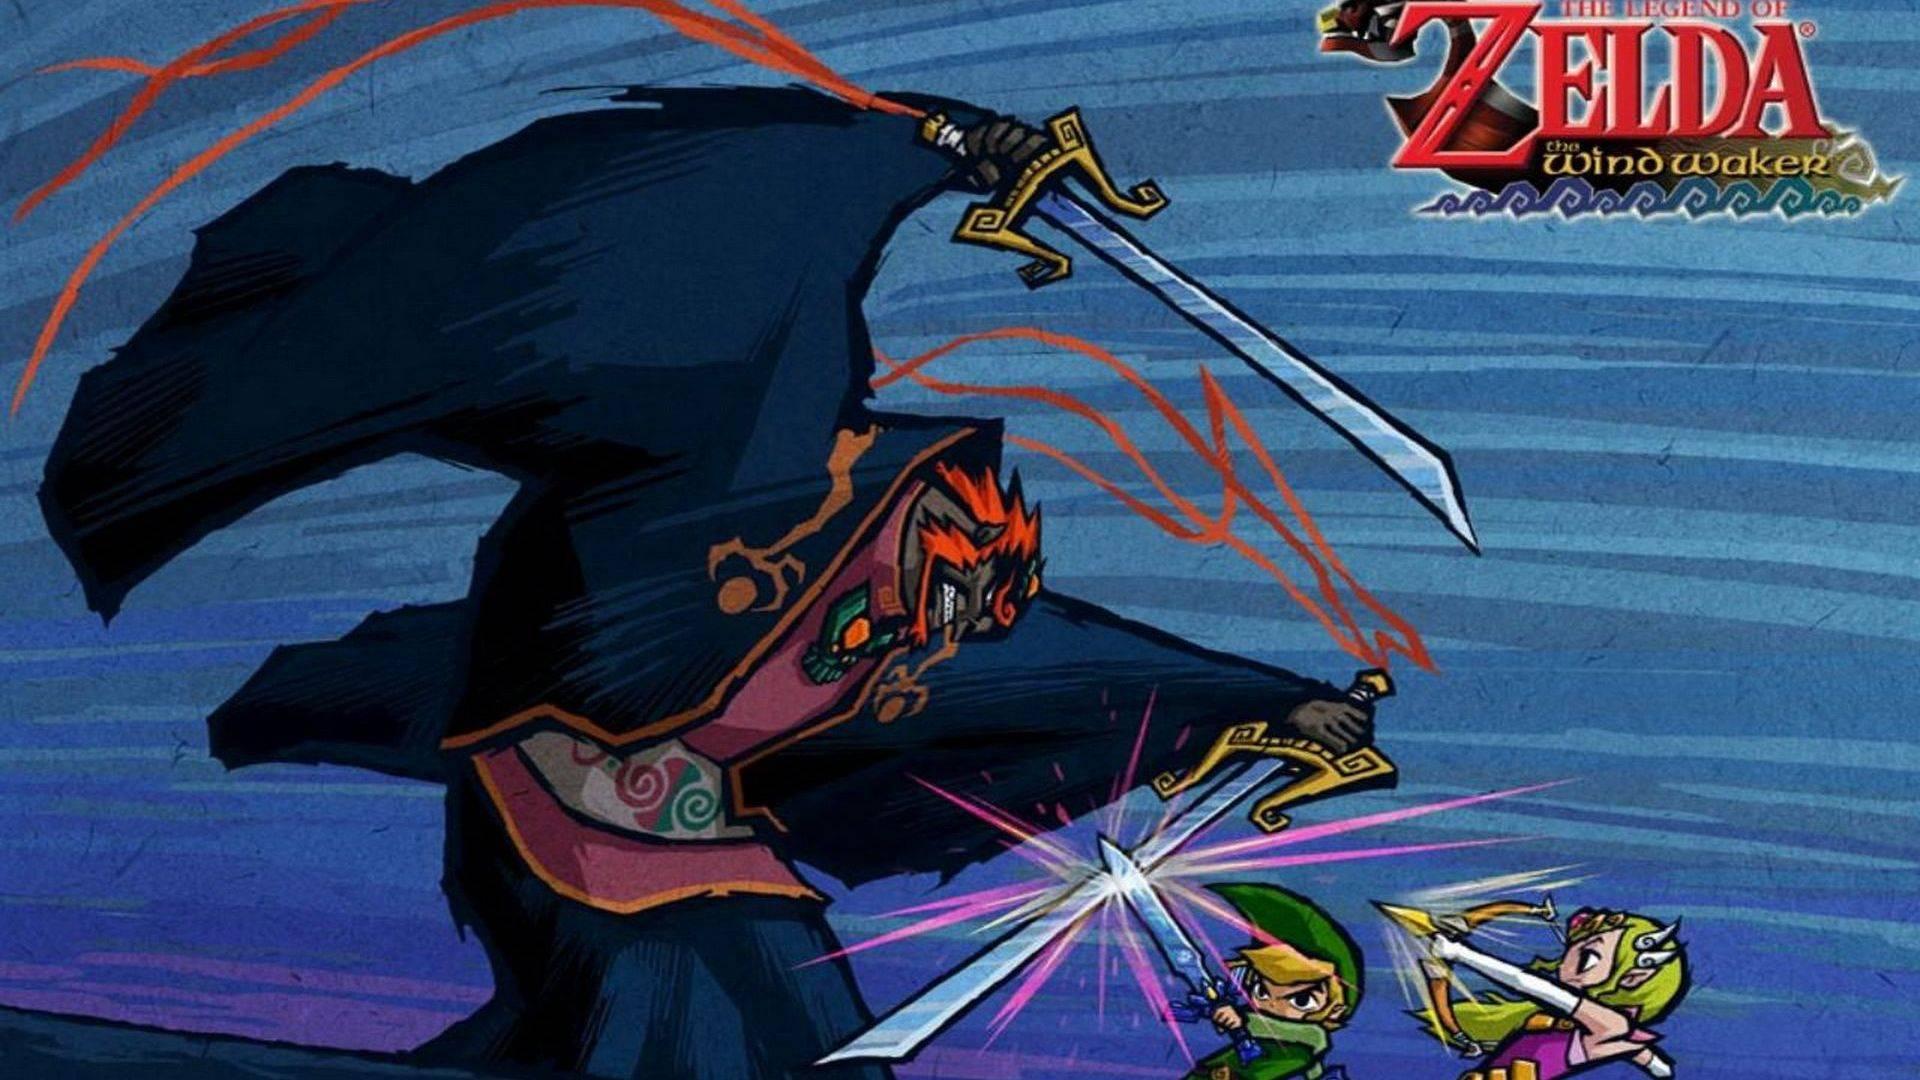 Free Download The Legend Of Zelda Wind Waker Hd Wii U